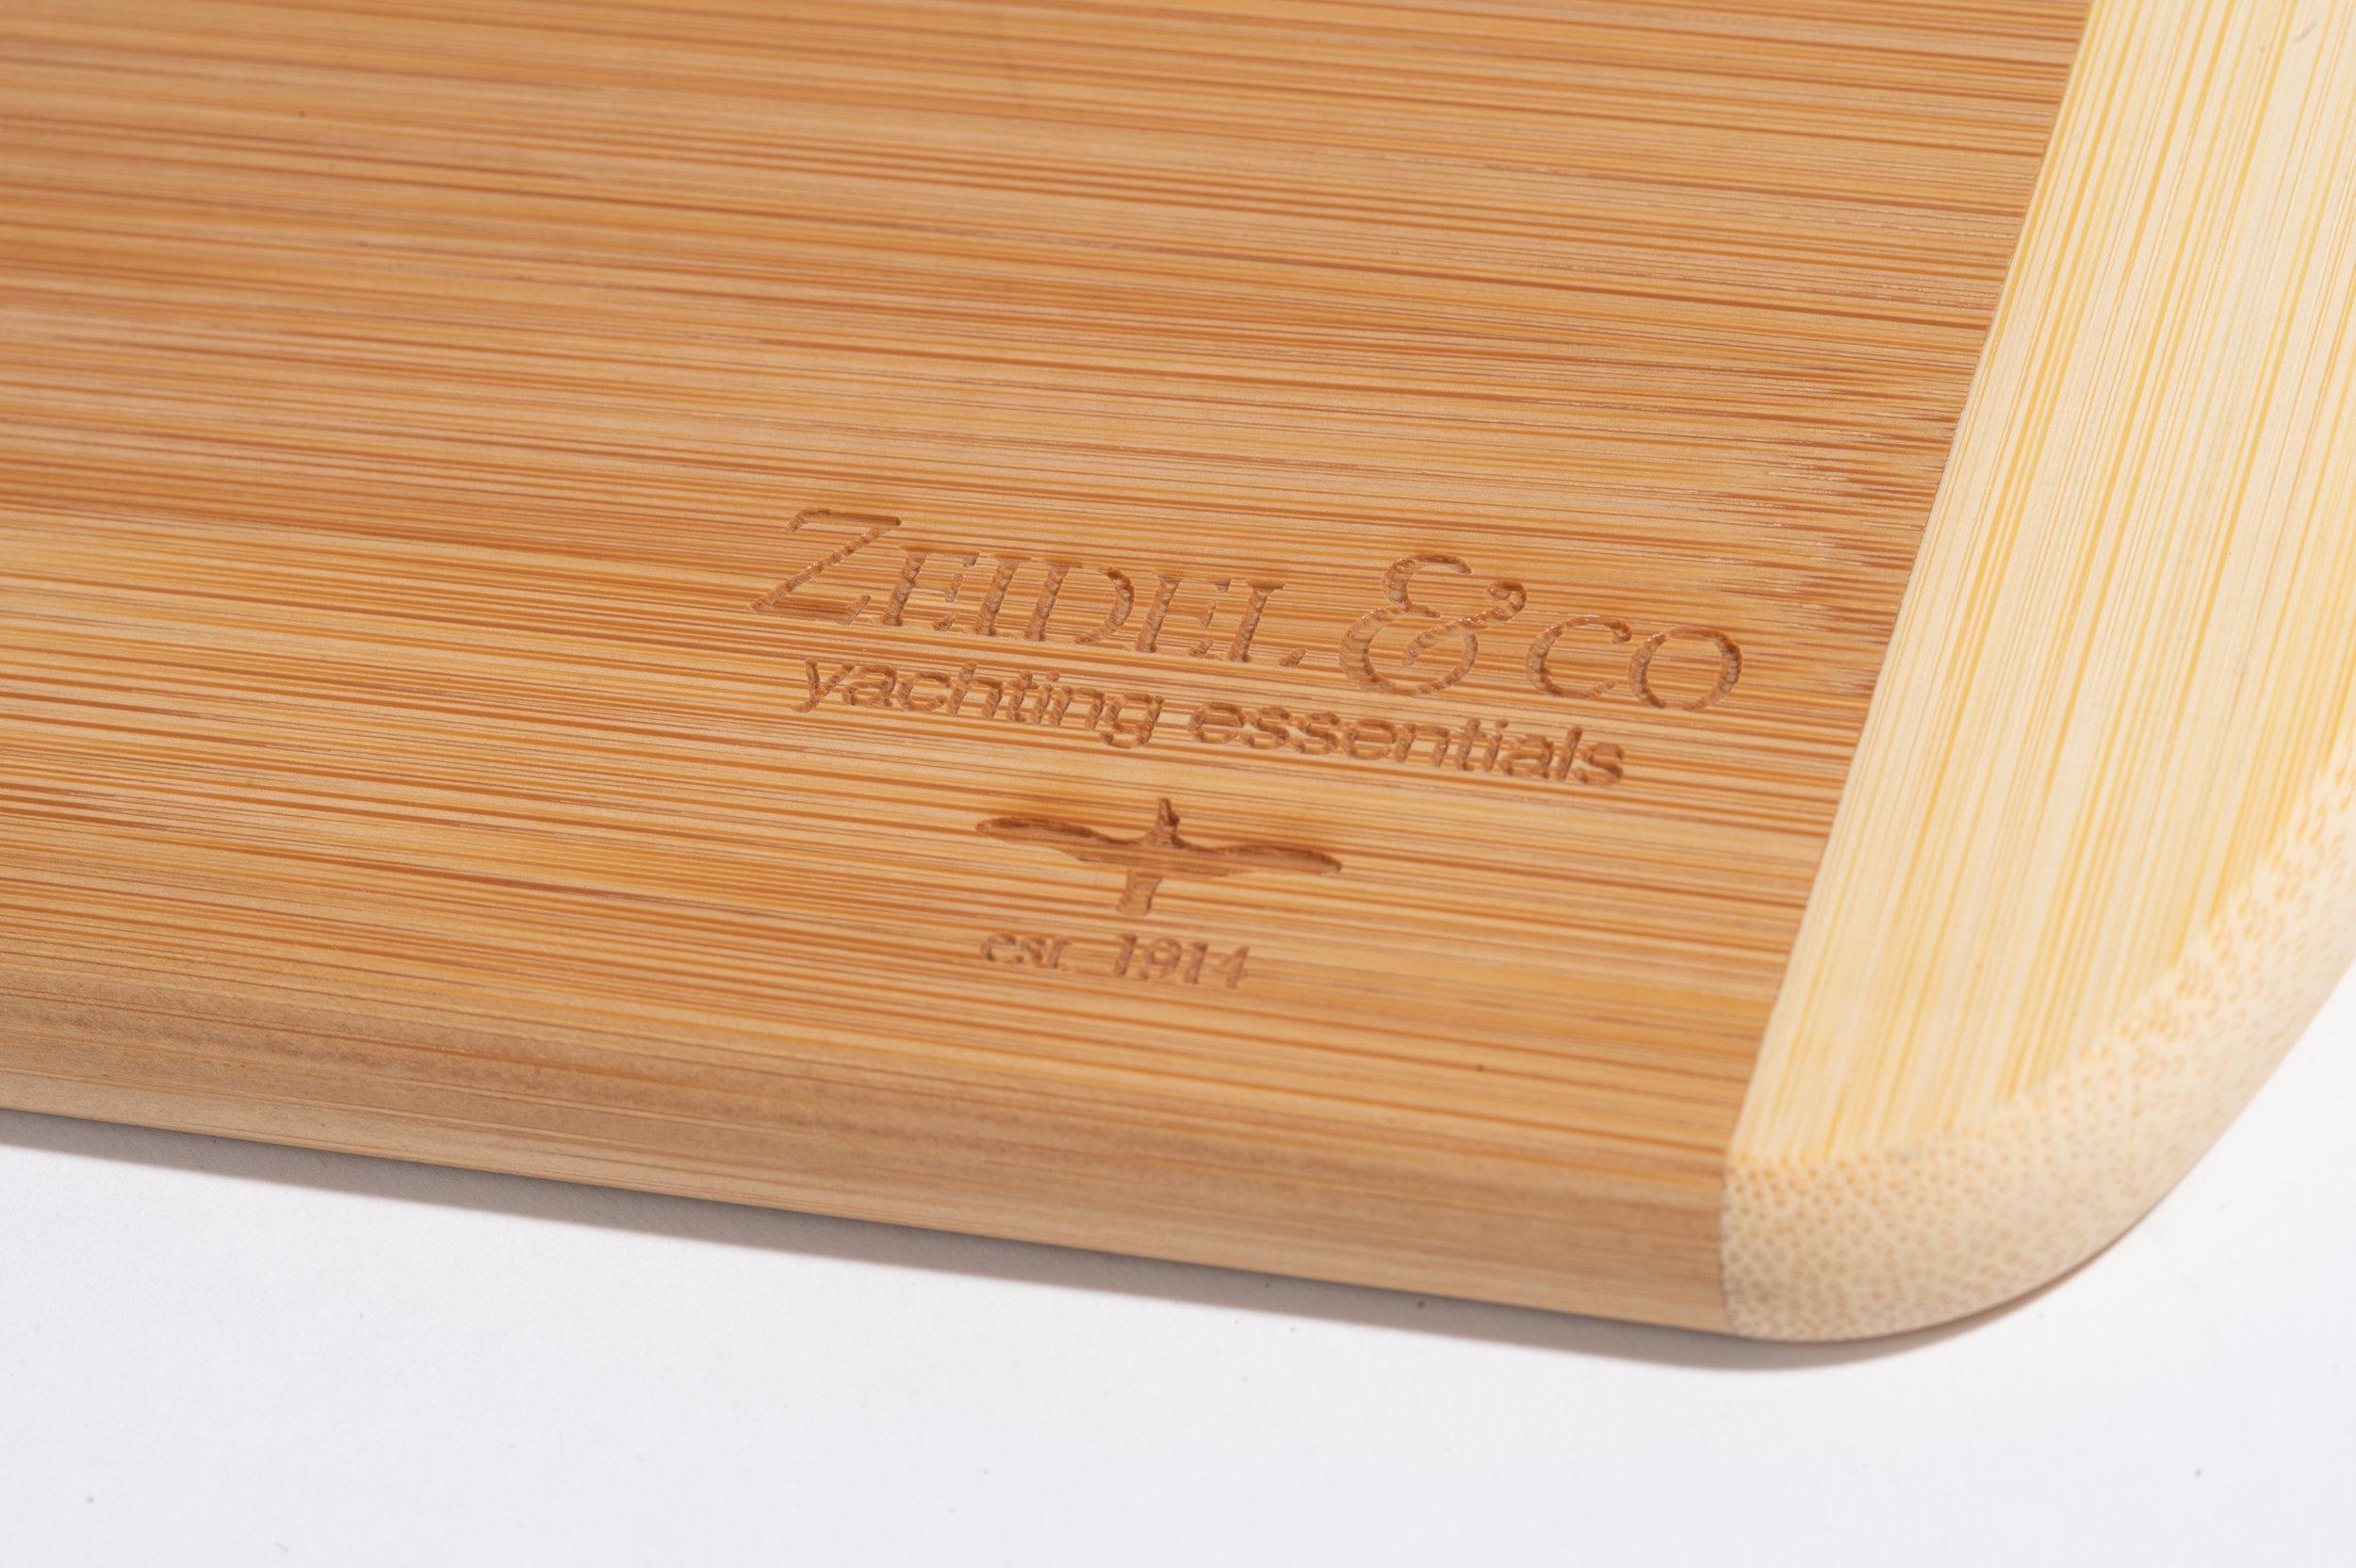 Custom bamboo cutting boards